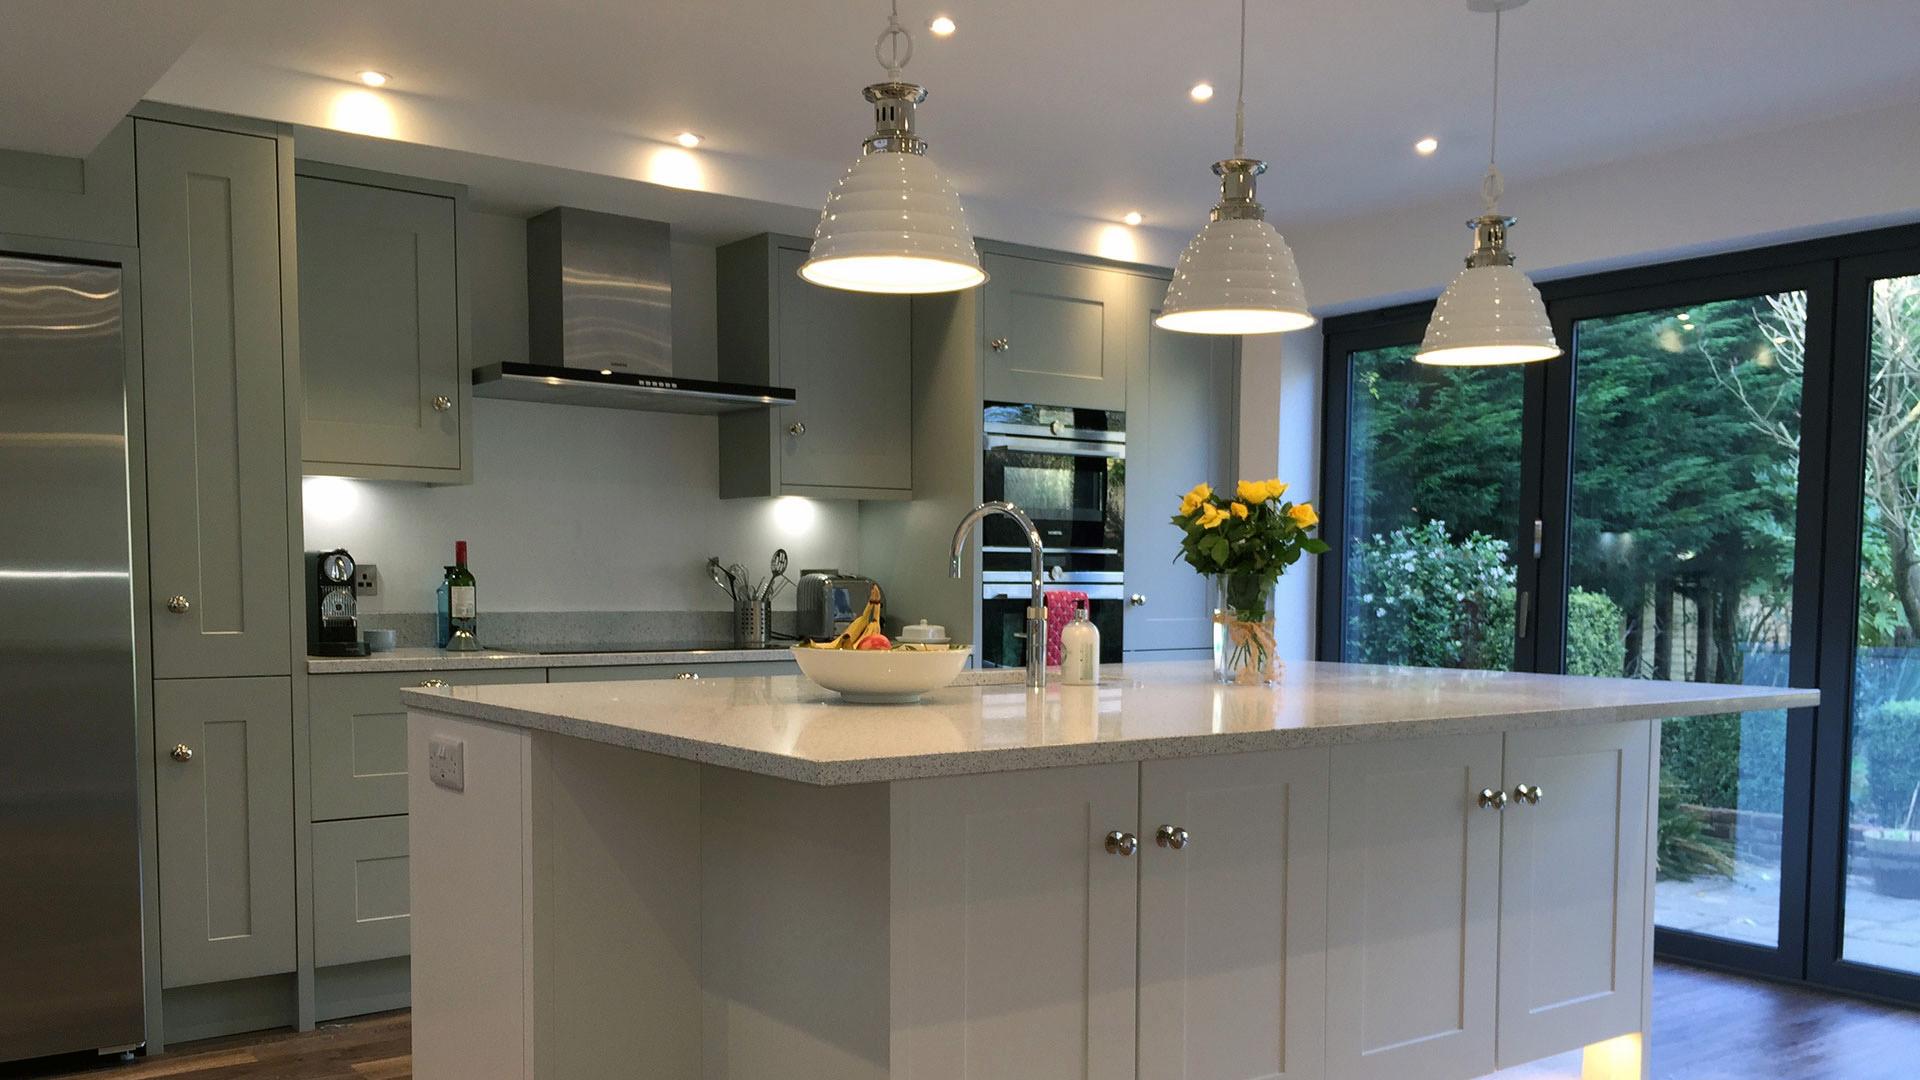 KitchenDiner Remodel  SurveyCloud